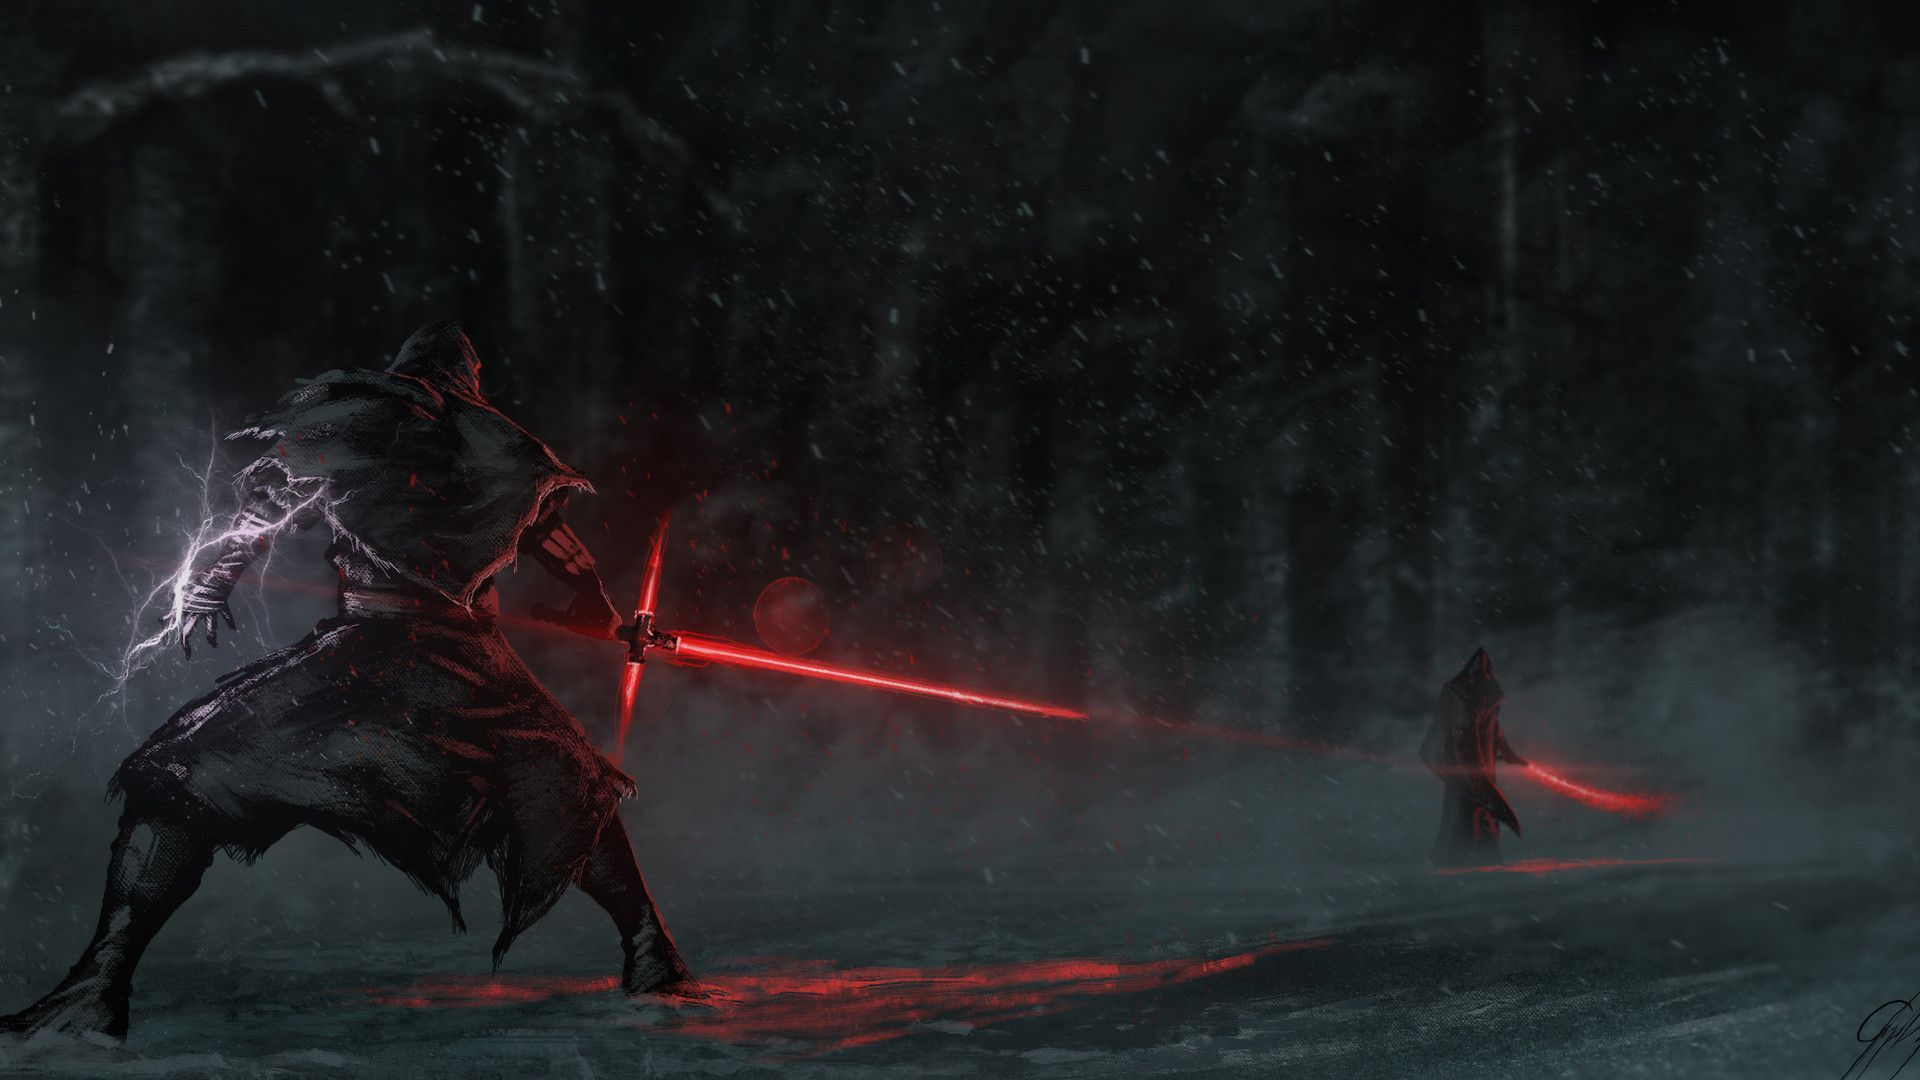 Gaming Desktop Hintergrund 4k In 2020 Star Wars Wallpaper Star Wars Fan Art Star Wars Art